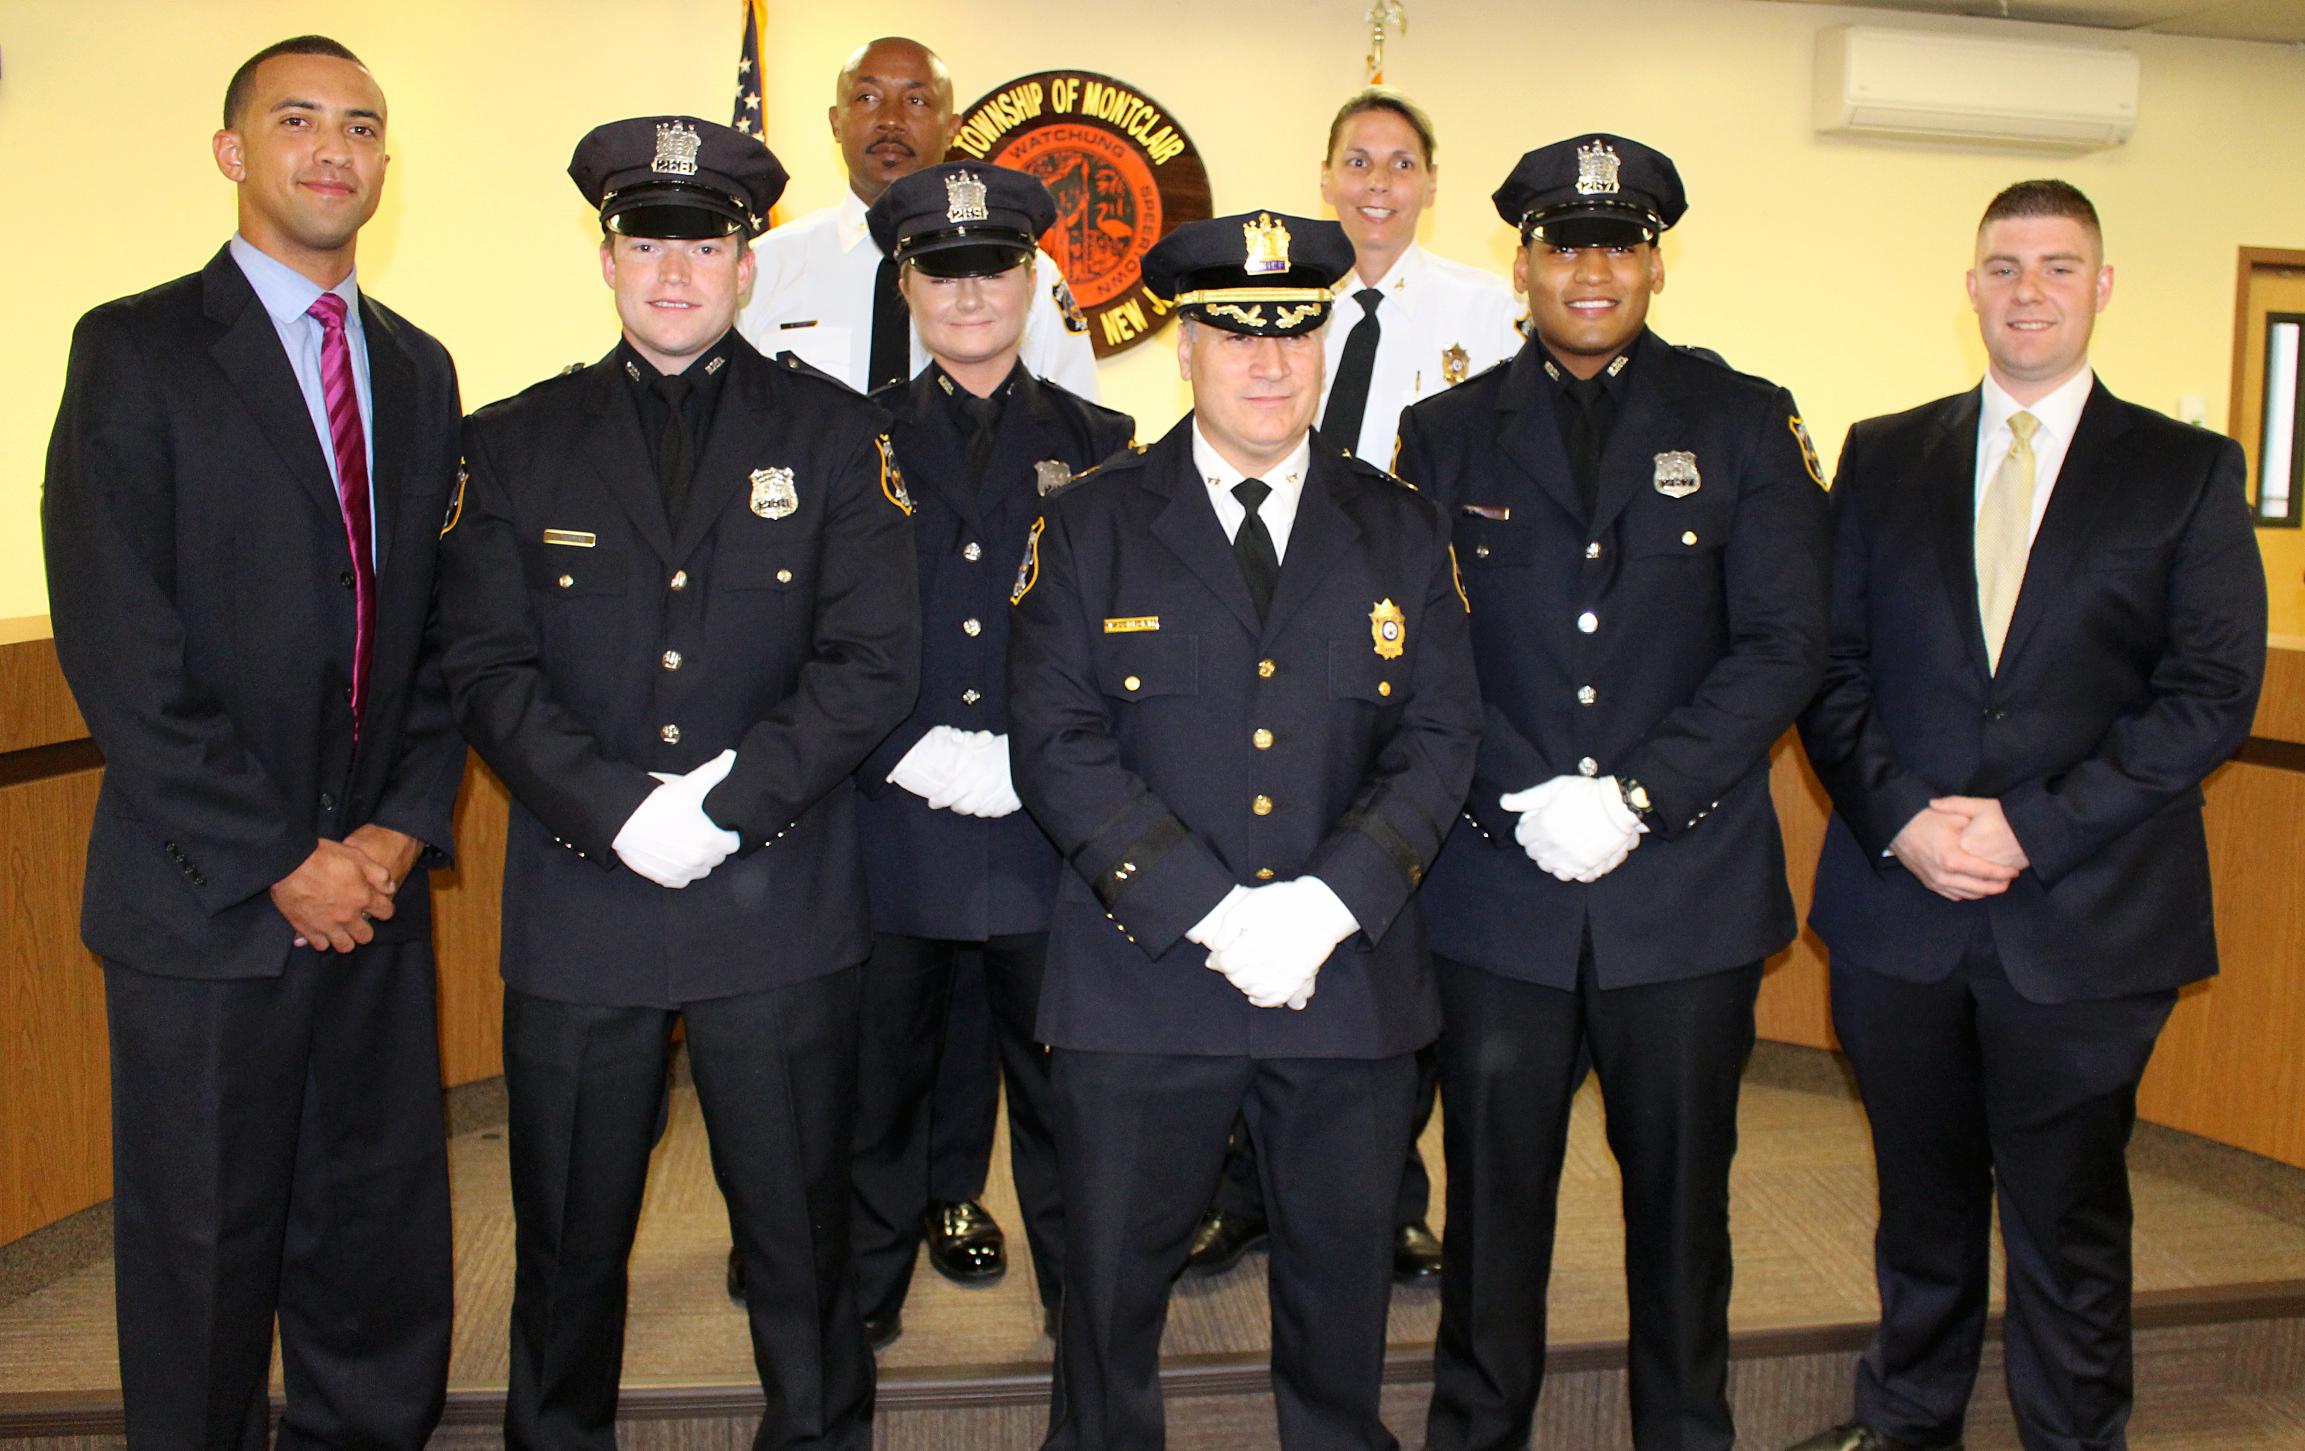 a234d4ad5d4c0da47c59_MPD-officers-11-03-16.jpg